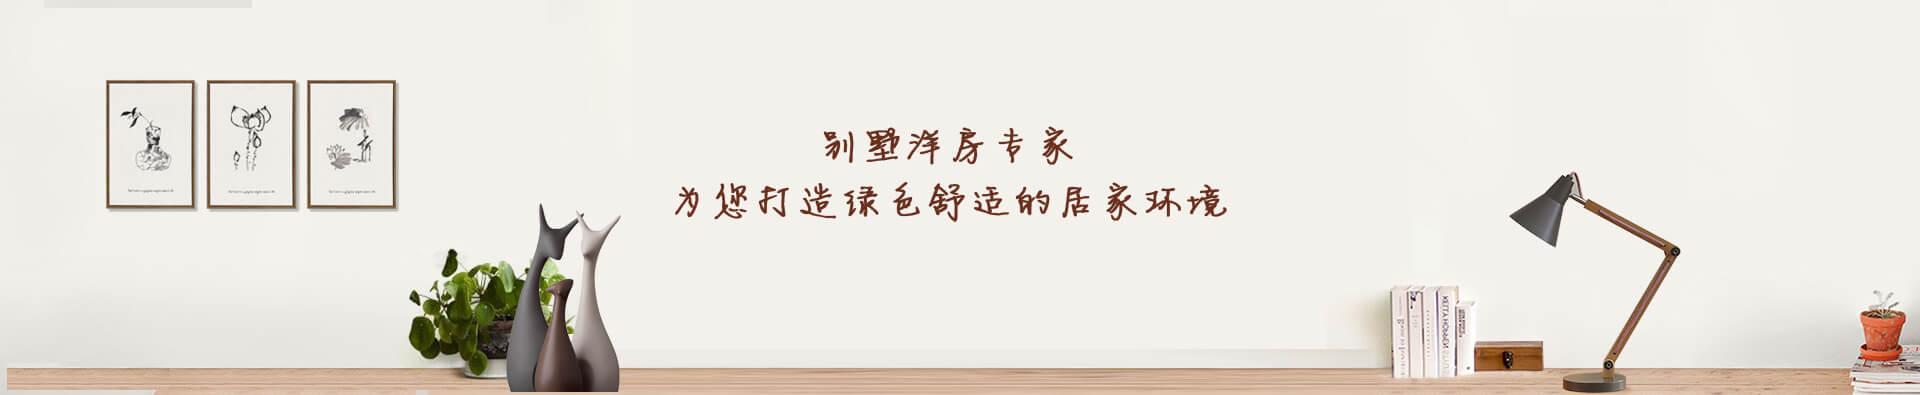 bob官方网站登录_bob手机网页_bob下载